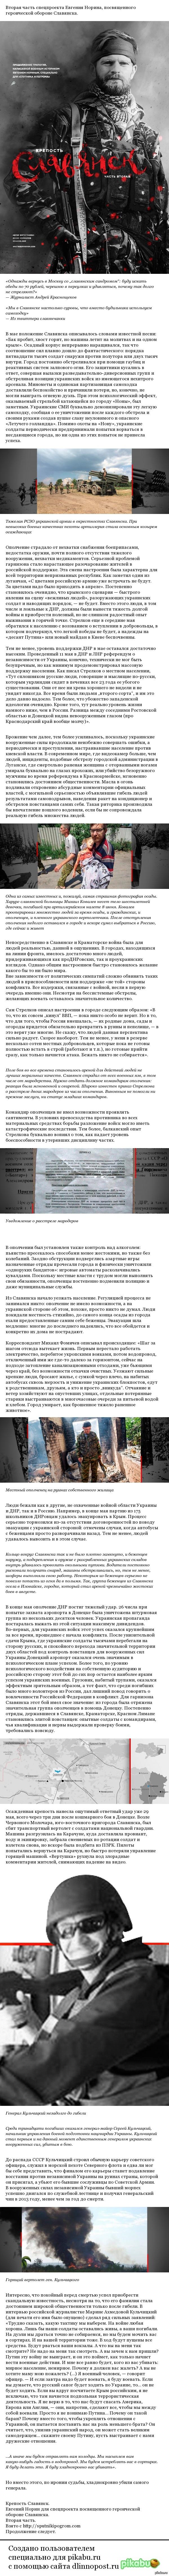 "Крепость Славянск. Часть вторая. (2.1) (1.1) <a href=""http://pikabu.ru/story/_2714521"">http://pikabu.ru/story/_2714521</a>    (1.2) <a href=""http://pikabu.ru/story/_2714762"">http://pikabu.ru/story/_2714762</a>  (2.2) <a href=""http://pikabu.ru/story/_2721617"">http://pikabu.ru/story/_2721617</a>"